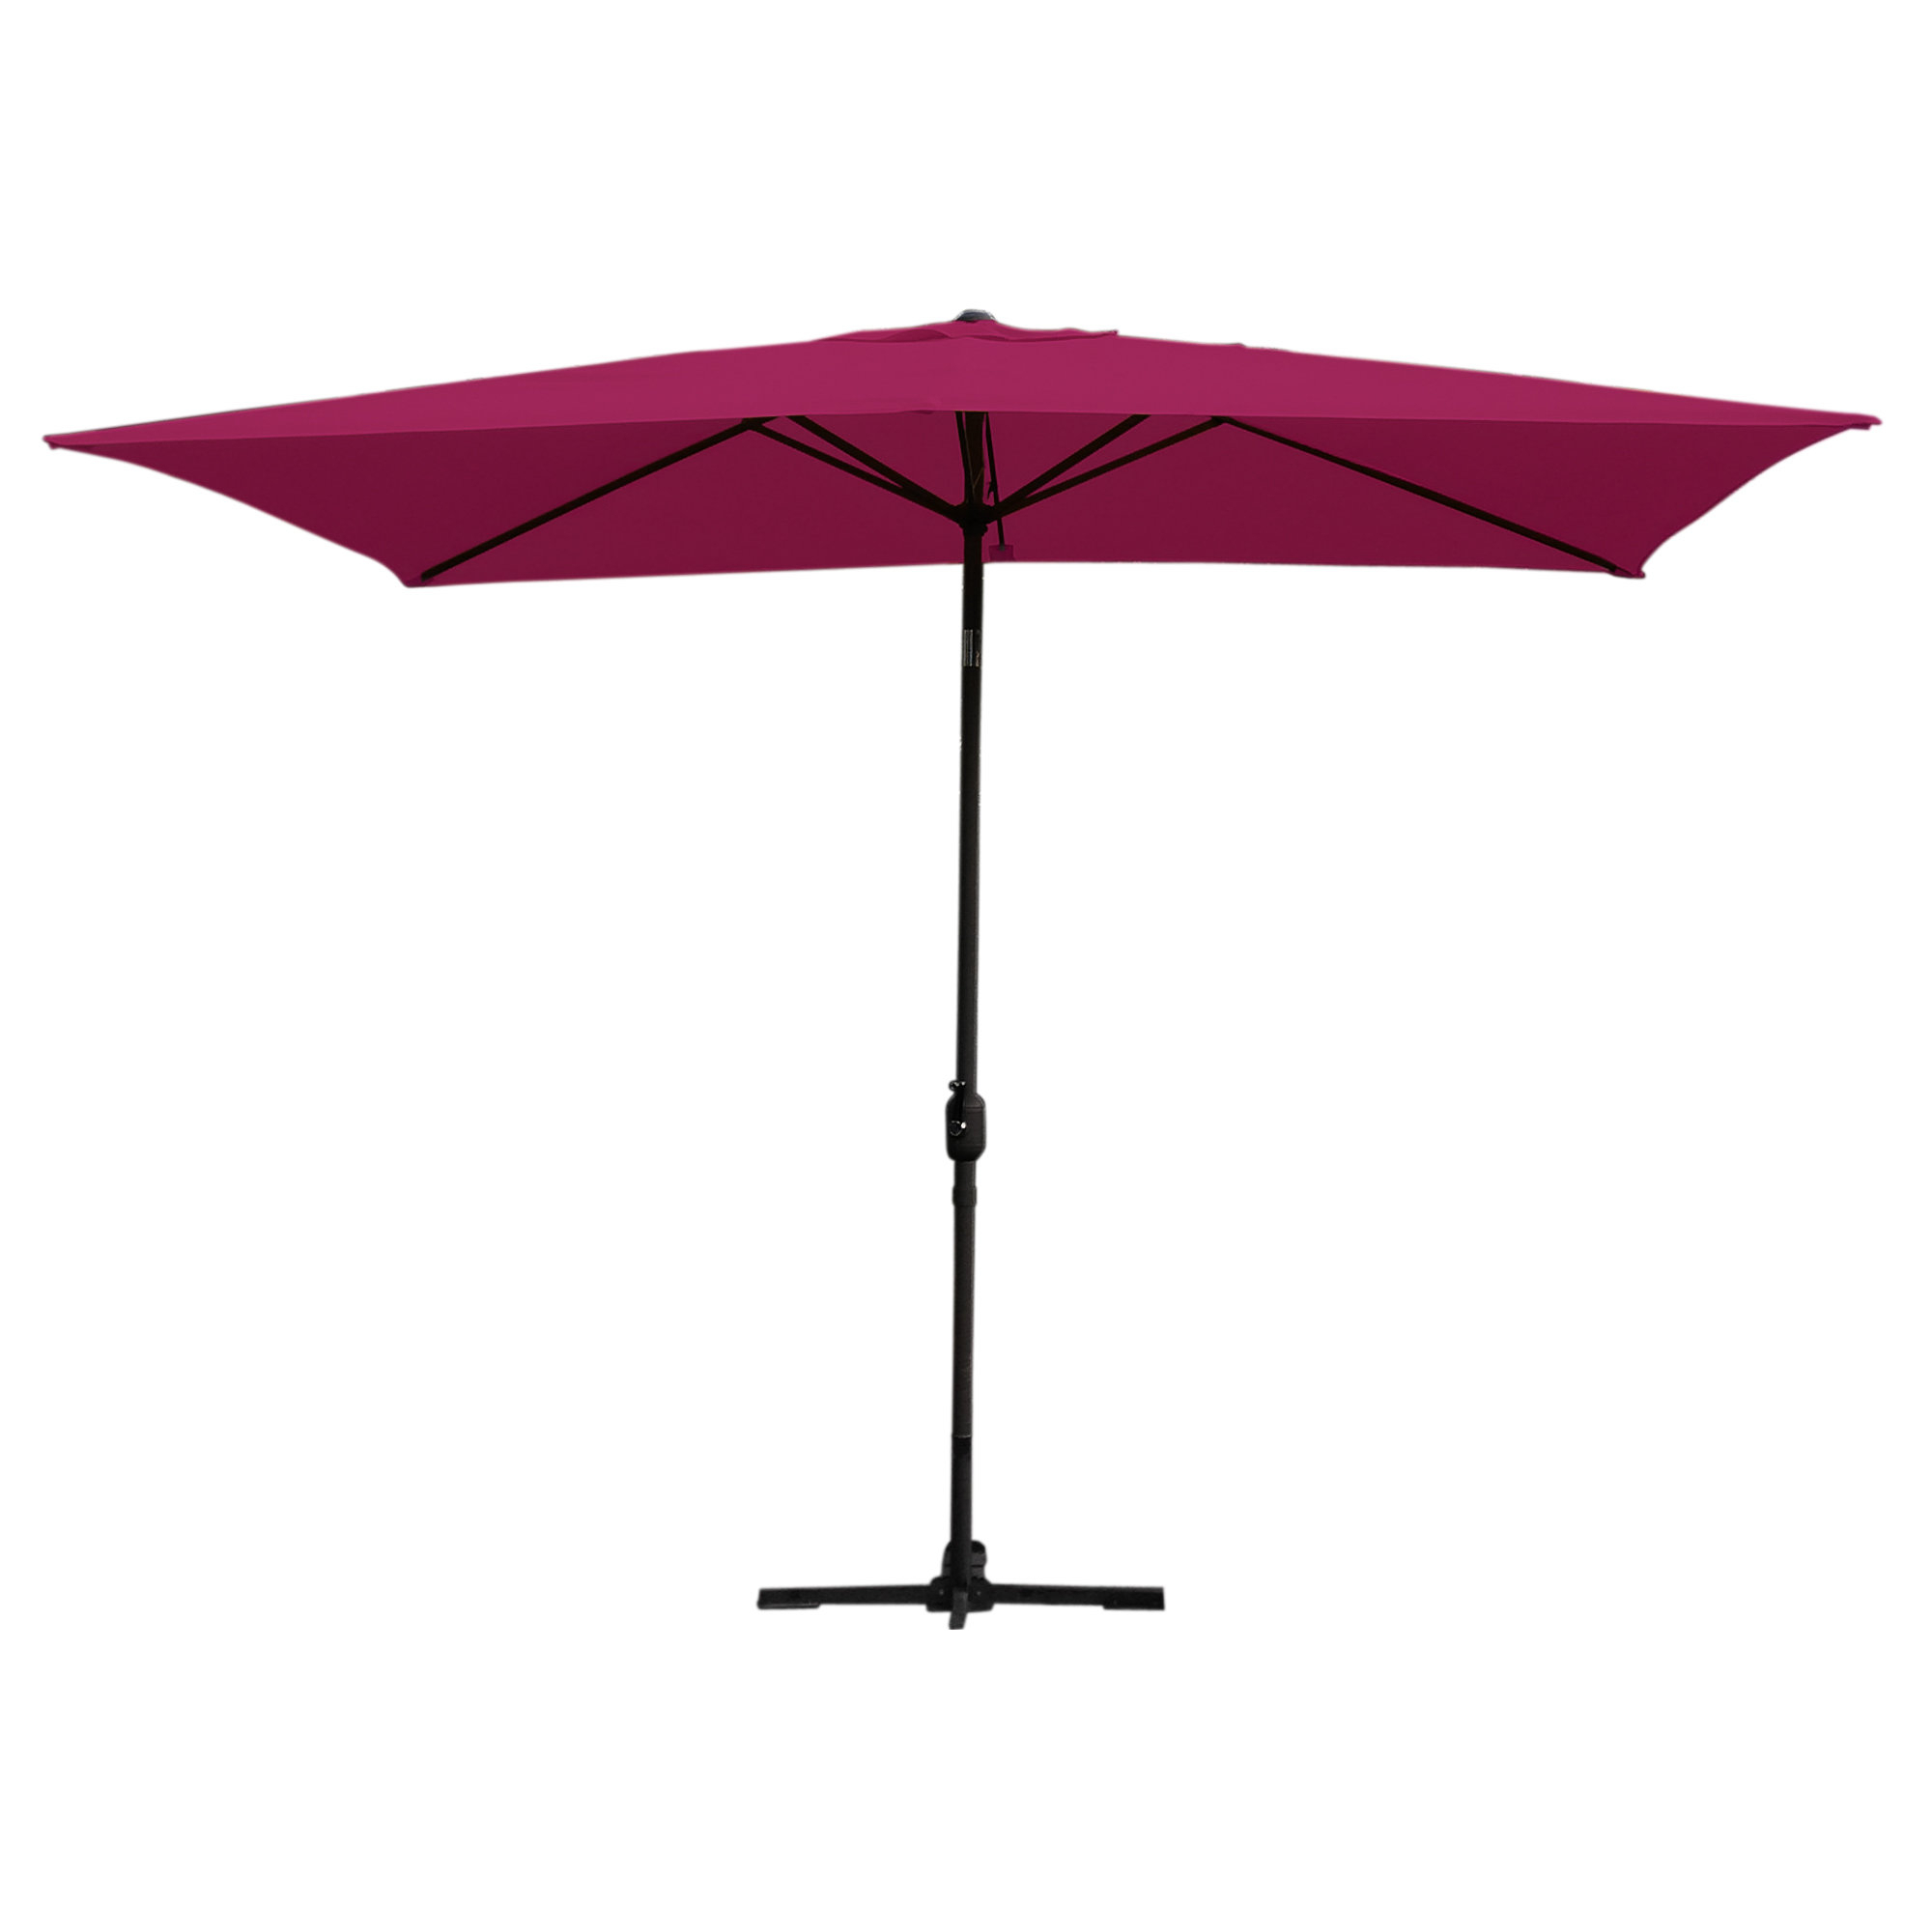 Wayfair Pertaining To Pau Rectangular Market Umbrellas (View 7 of 20)